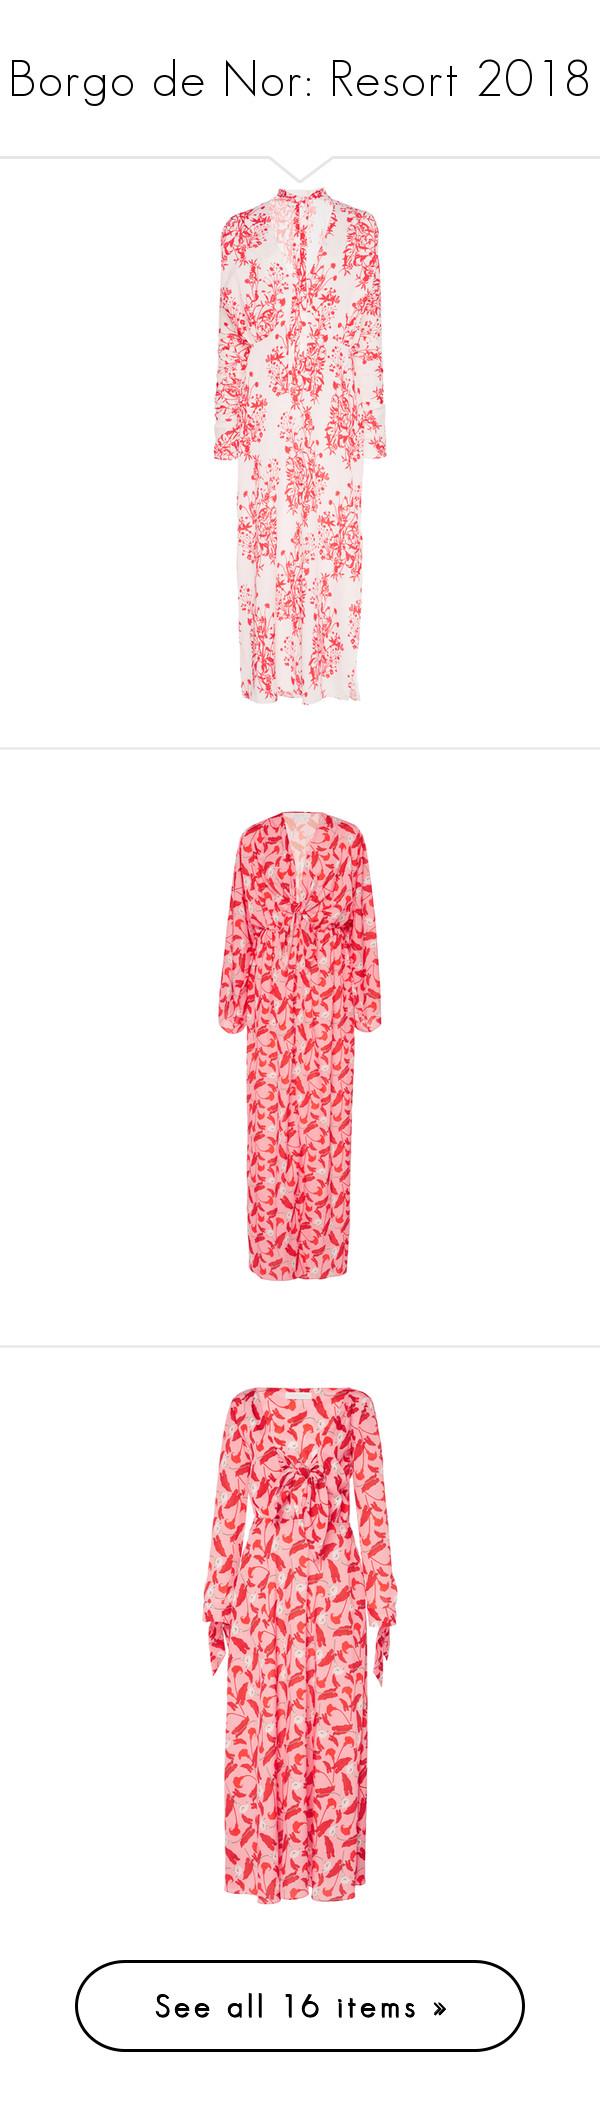 """Borgo de Nor: Resort 2018"" by livnd ❤ liked on Polyvore featuring livndfashion, resort2018, livndborgodenor, BorgodeNor, dresses, print, necktie dress, pattern dress, neck tie dress and pink dress"